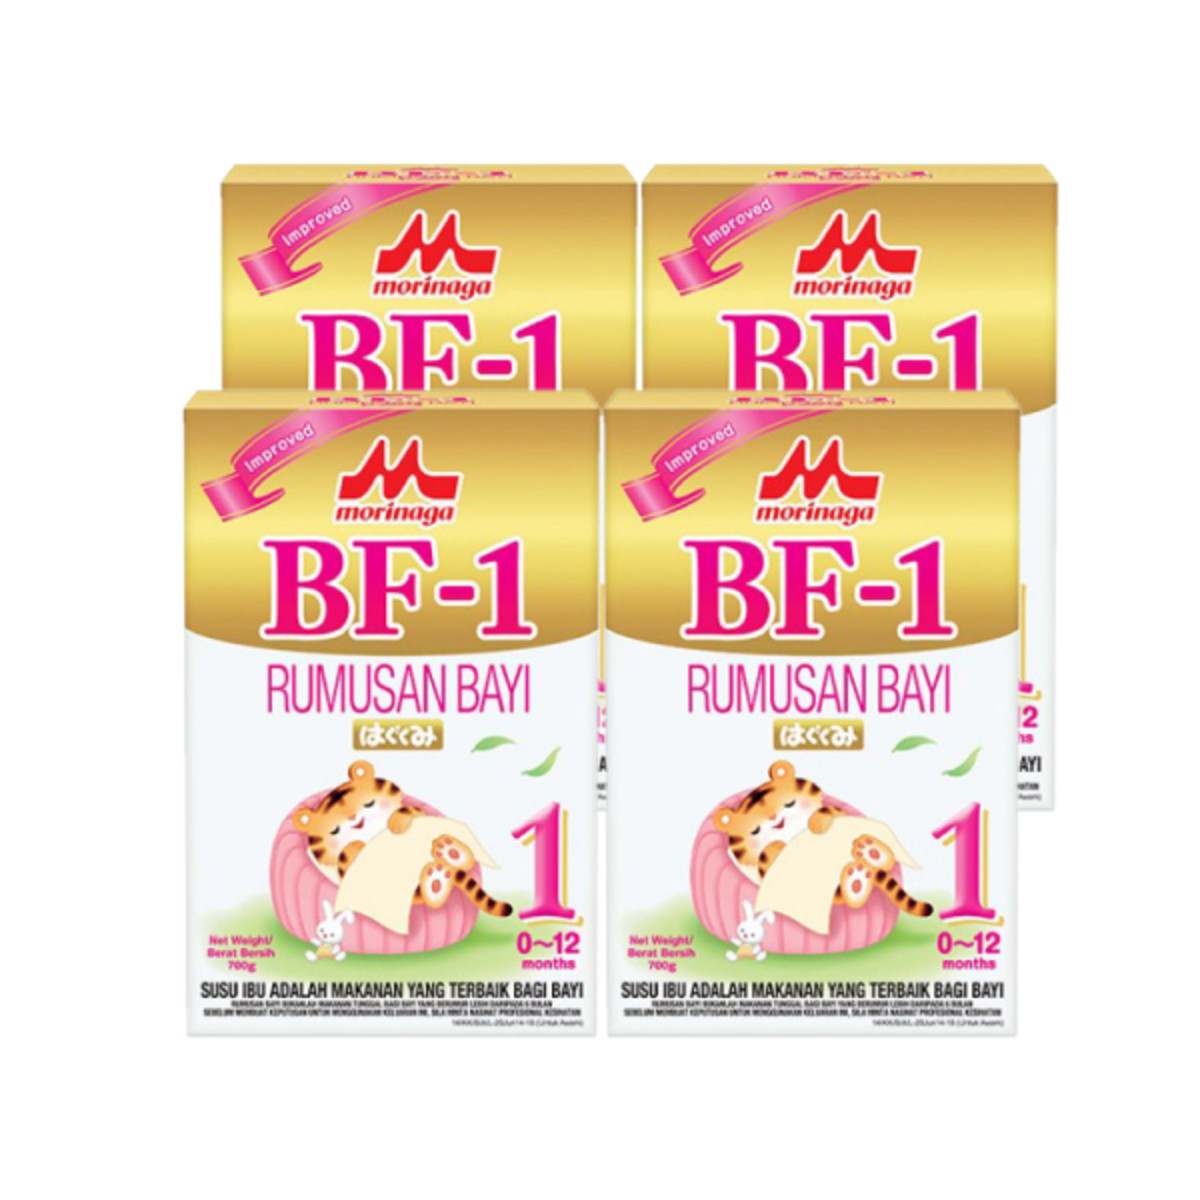 Morinaga BF-1 Step 1 (0-12 months) 700g x 4